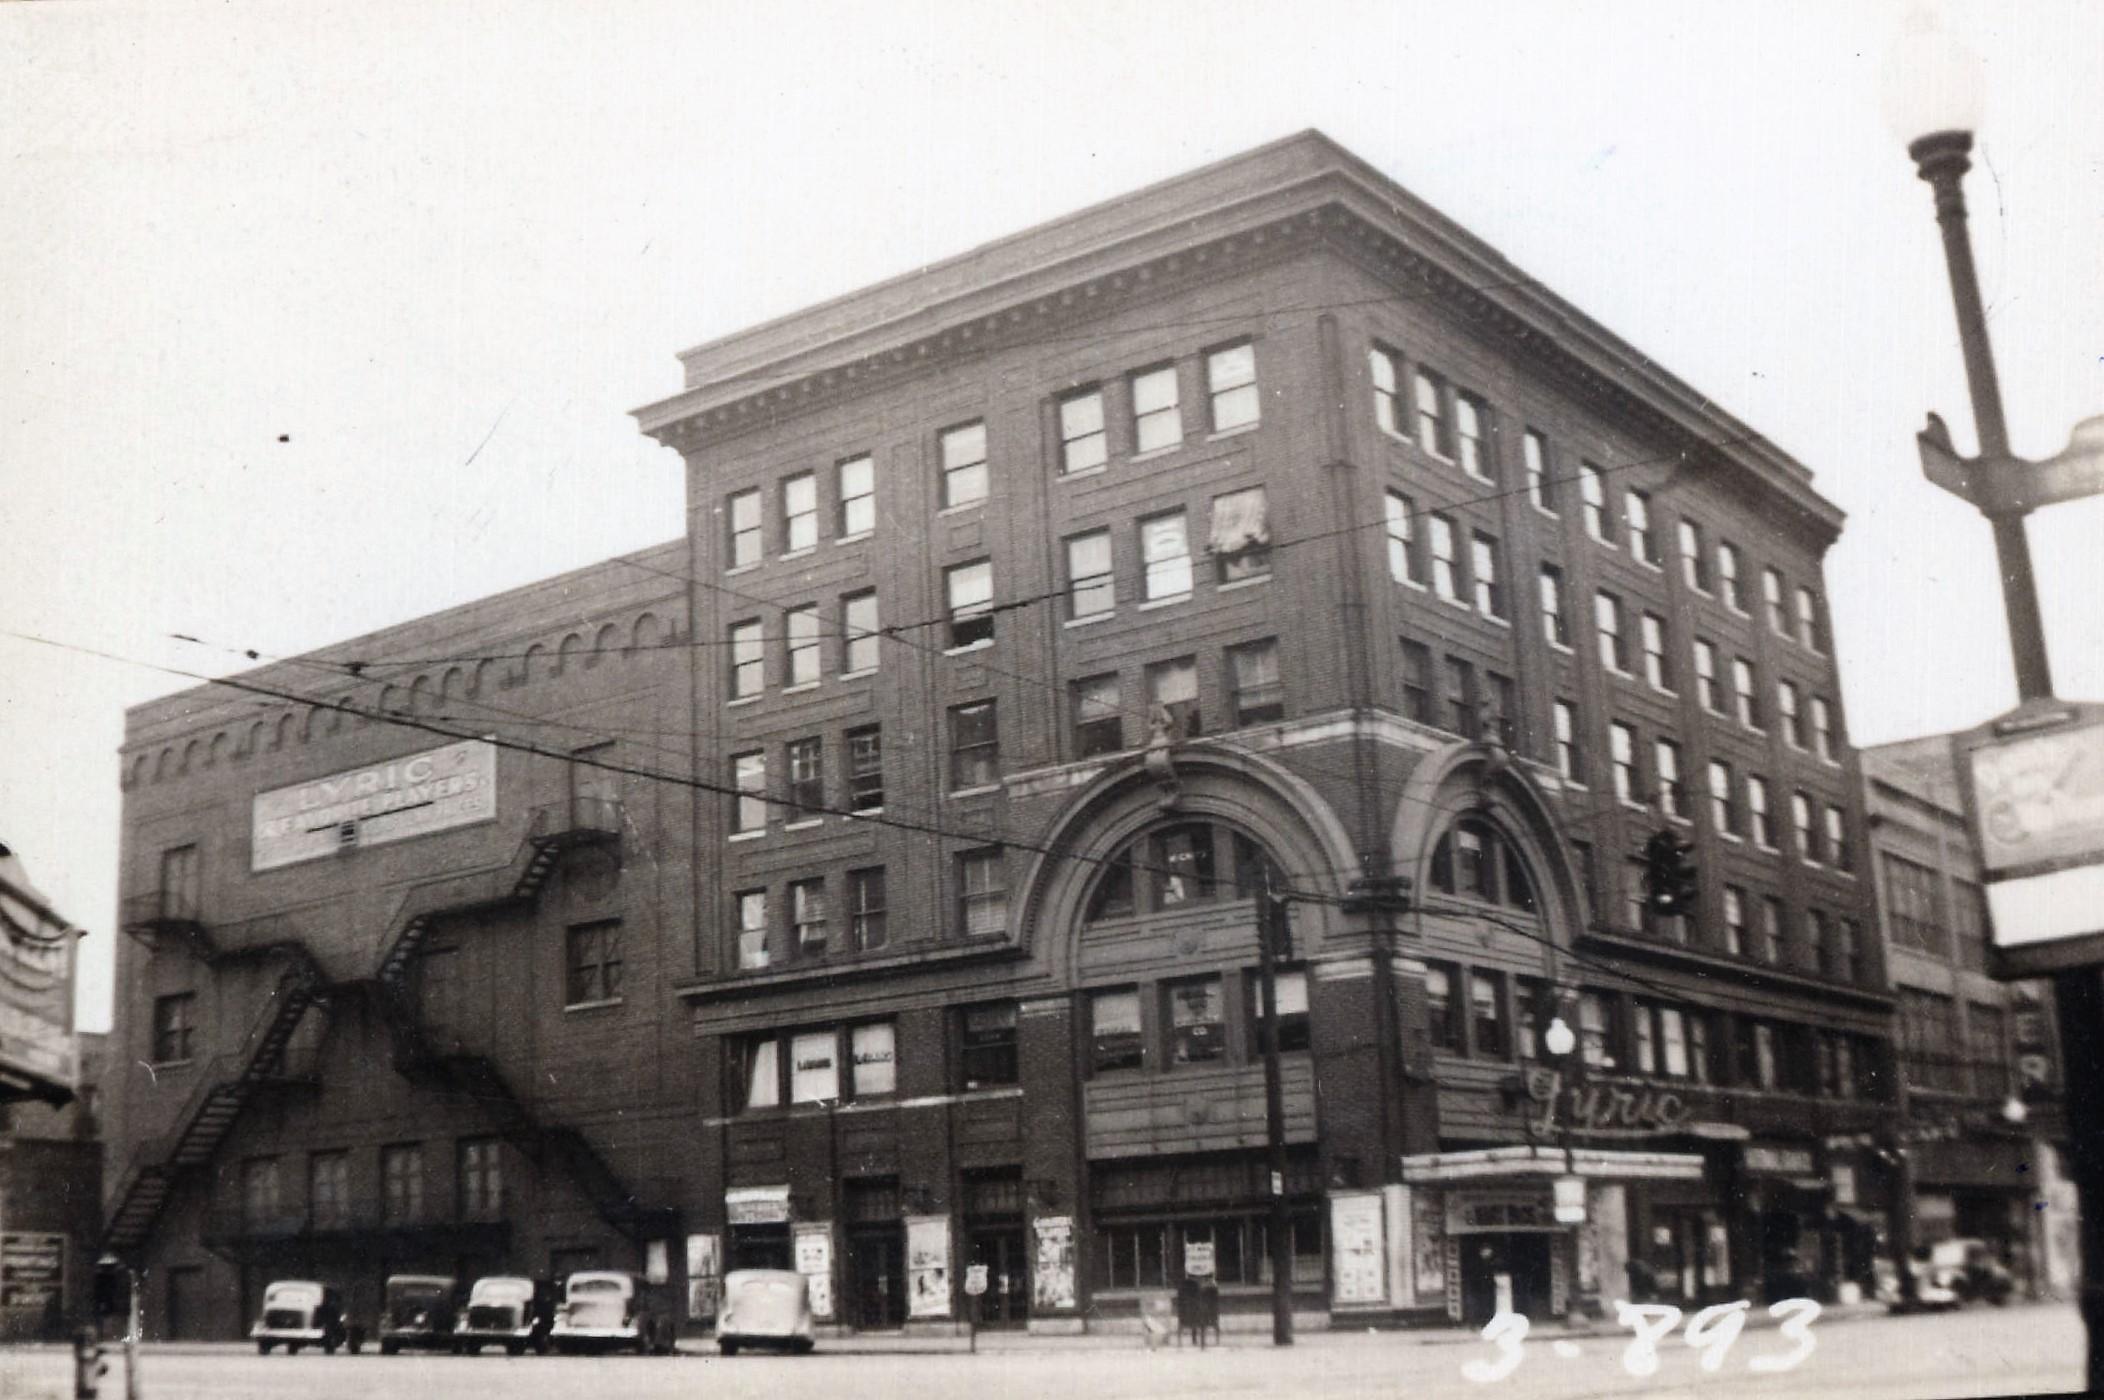 Lyric Theater ca. 1938 (Birmingham Public Library)